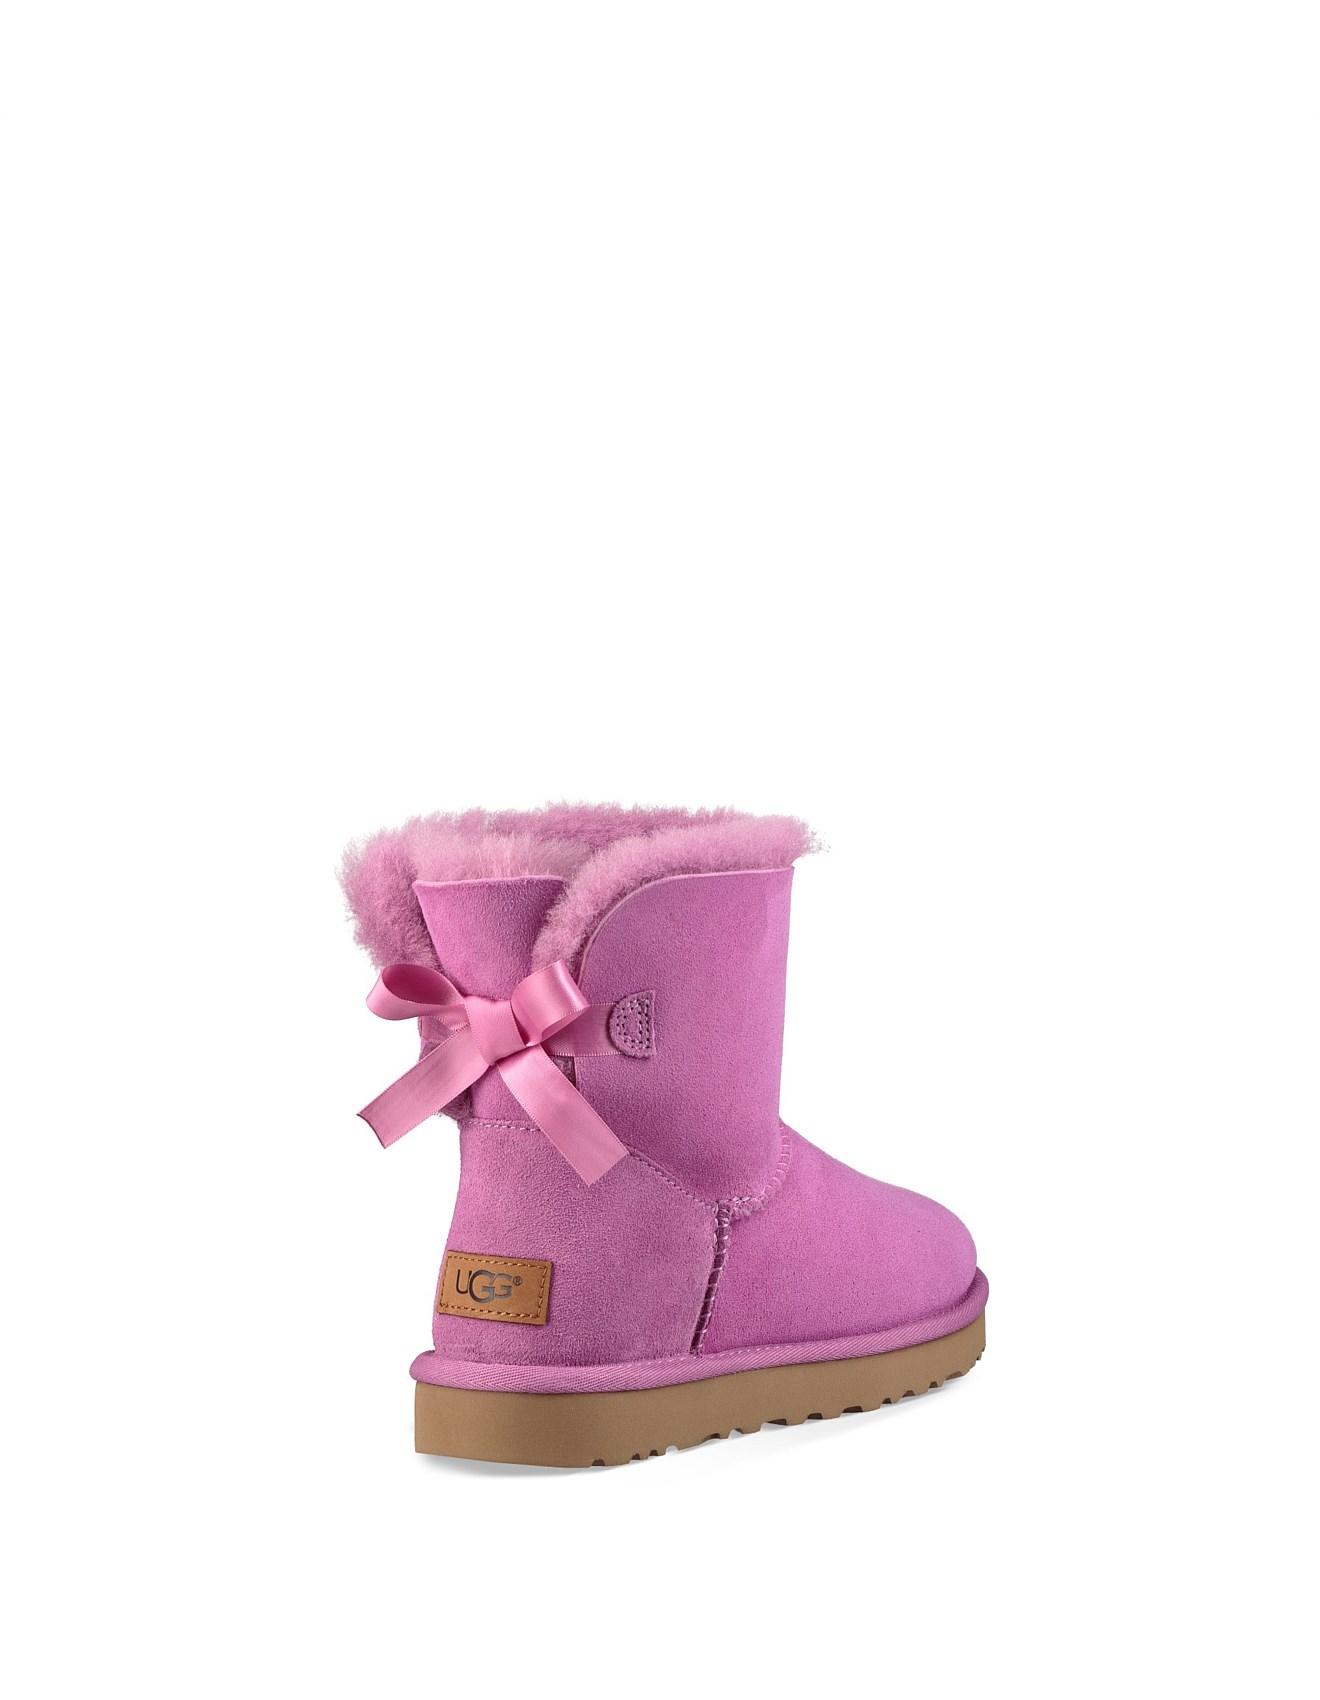 ac63337a954 Mini Bailey Bow II Boot